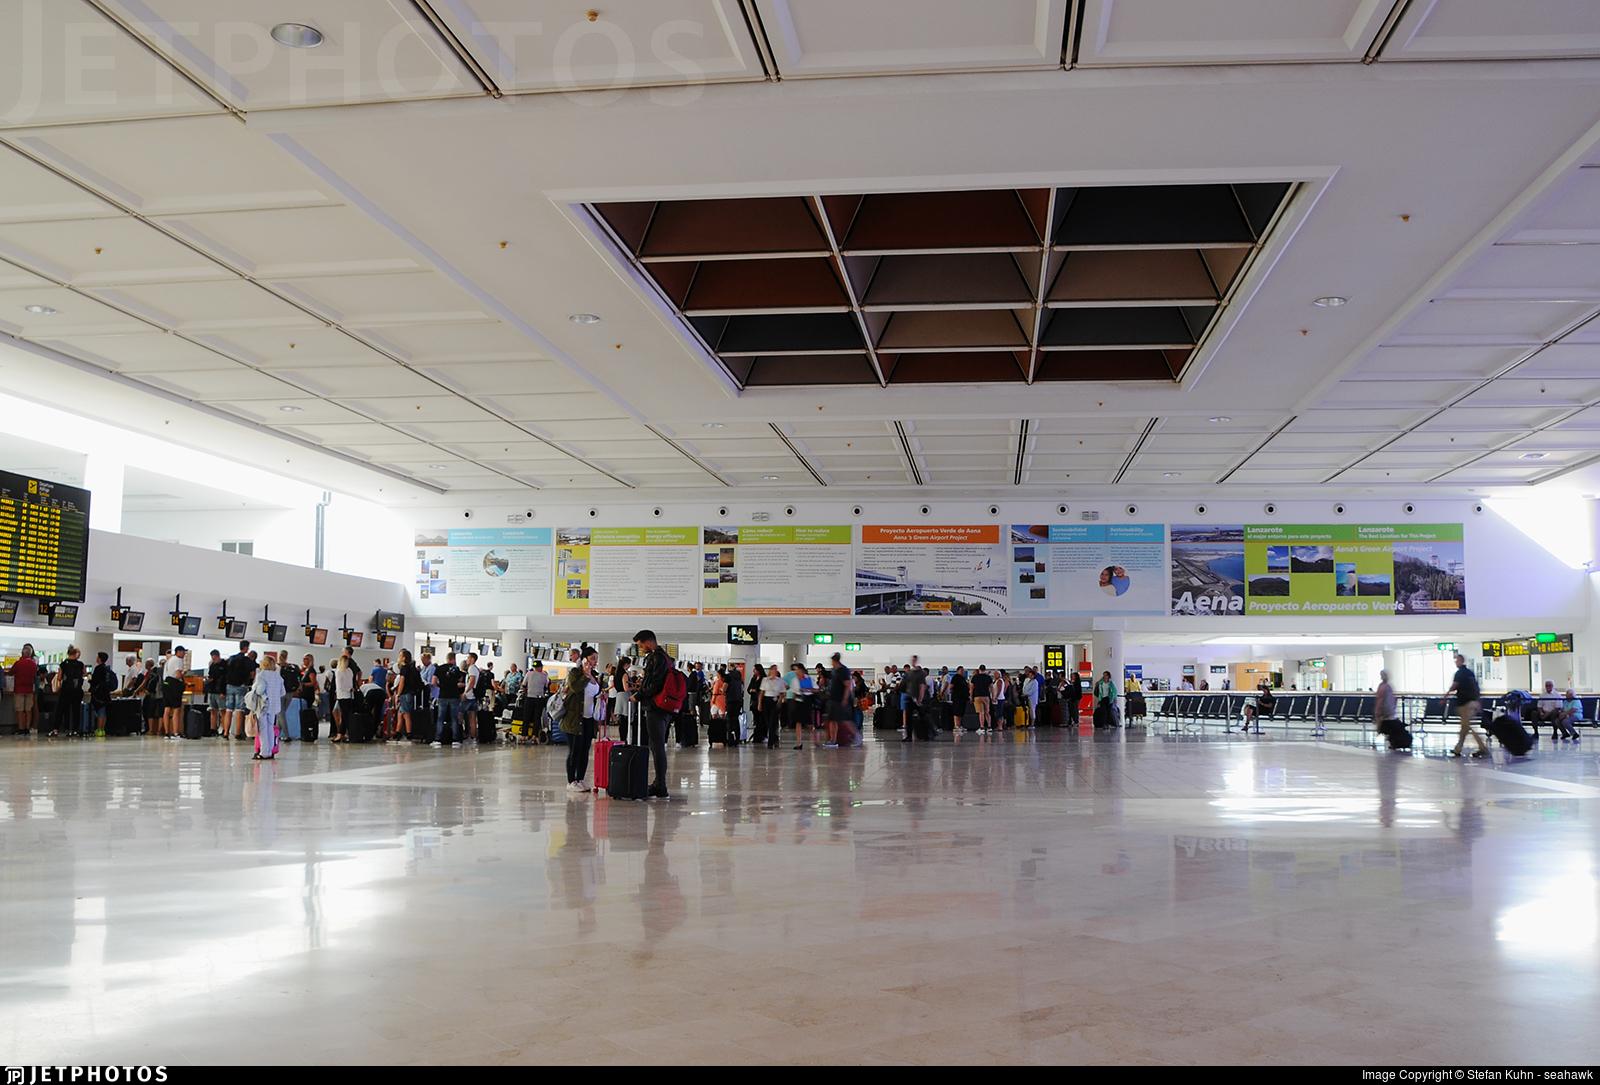 GCRR - Airport - Terminal